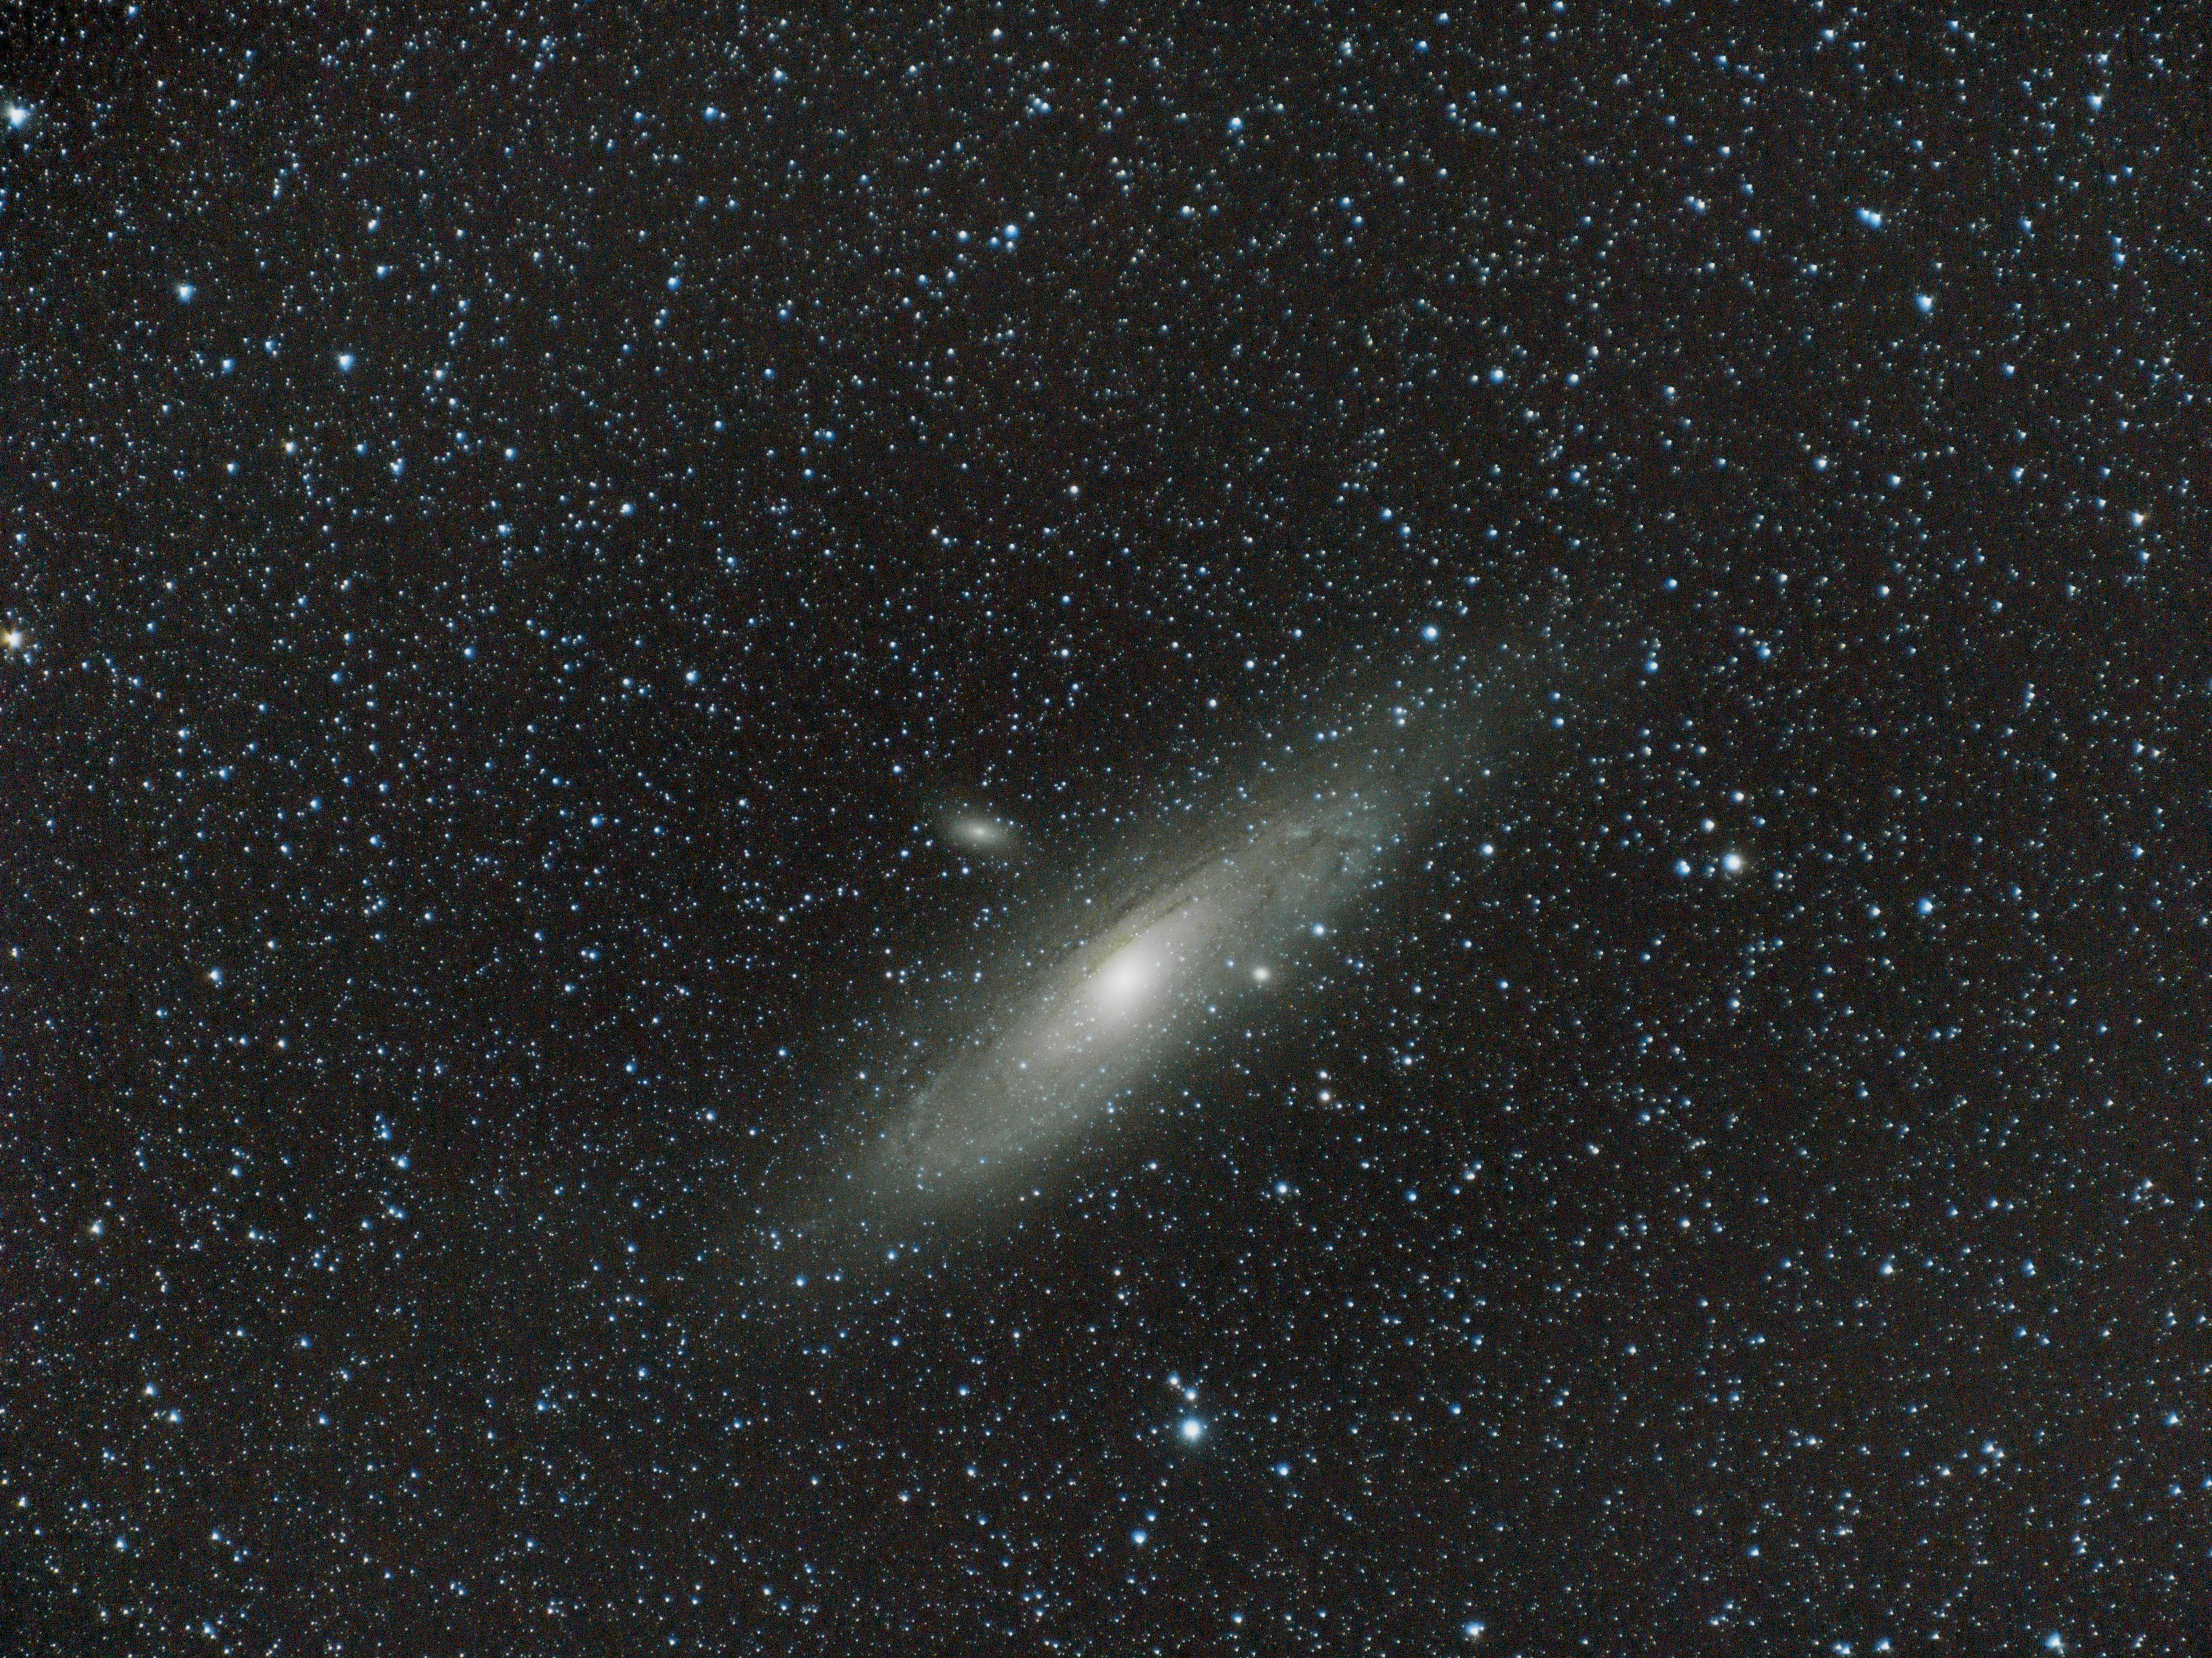 M31 - Voisine galactique Picture-6de56130adab403713bd94df682d70c5-original